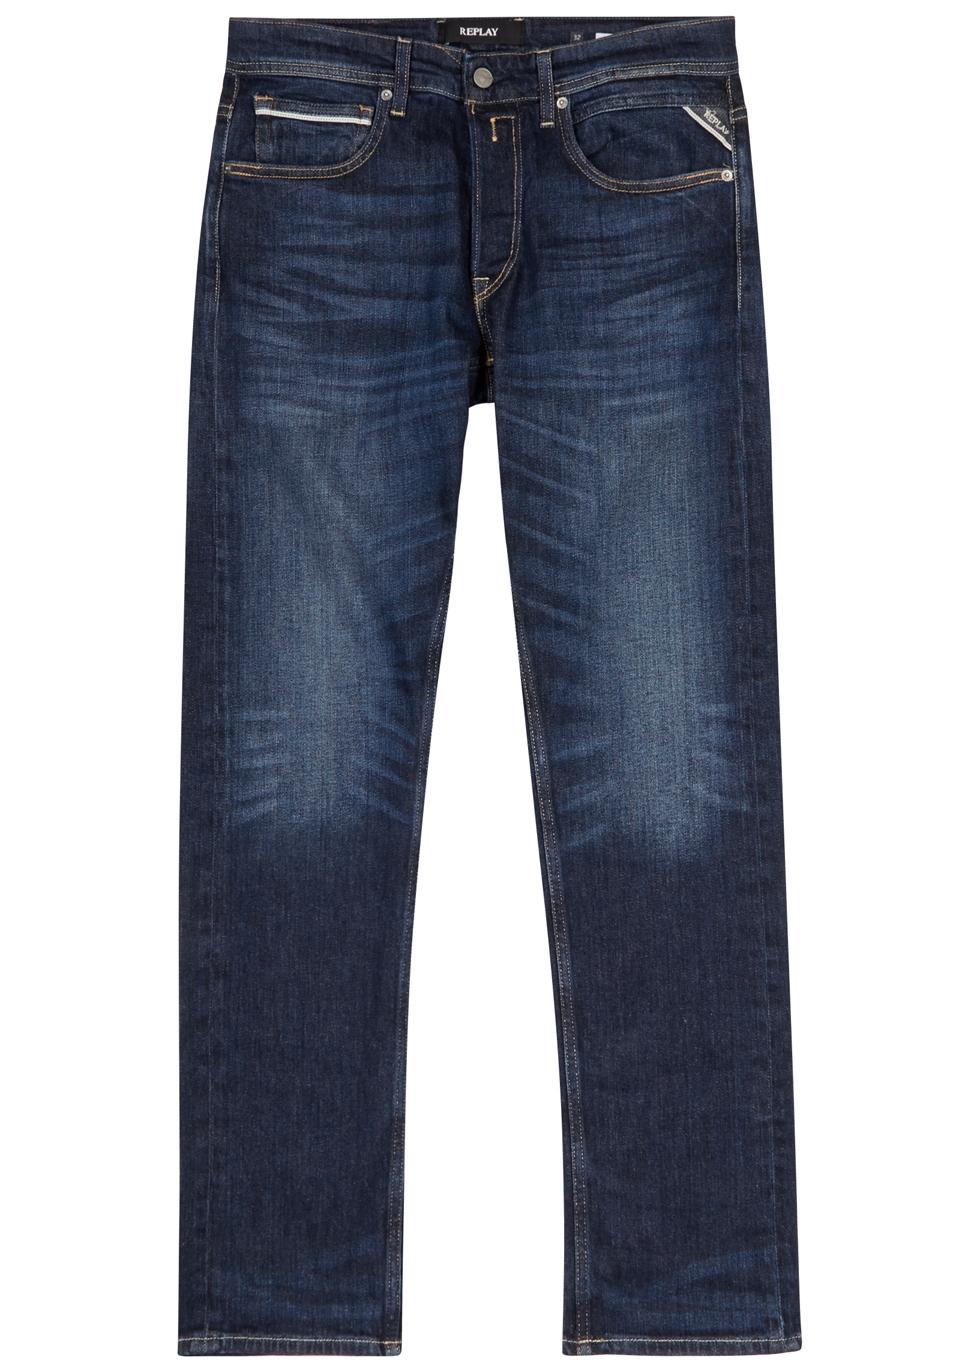 REPLAY Grover Indigo Straight-Leg Jeans